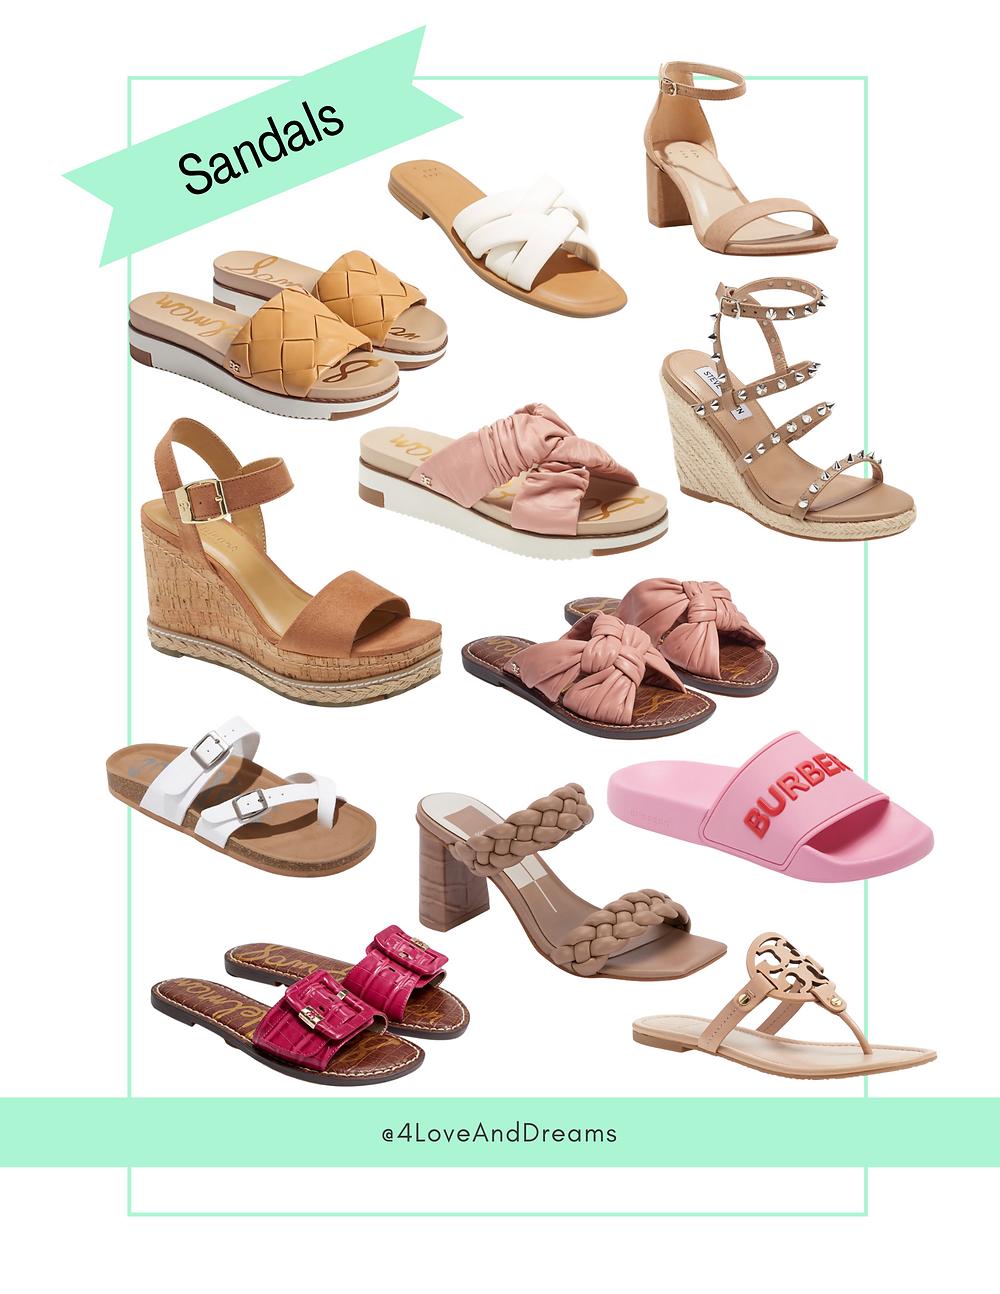 summer sandals. date night sandals. beach sandals. vacation sandals.